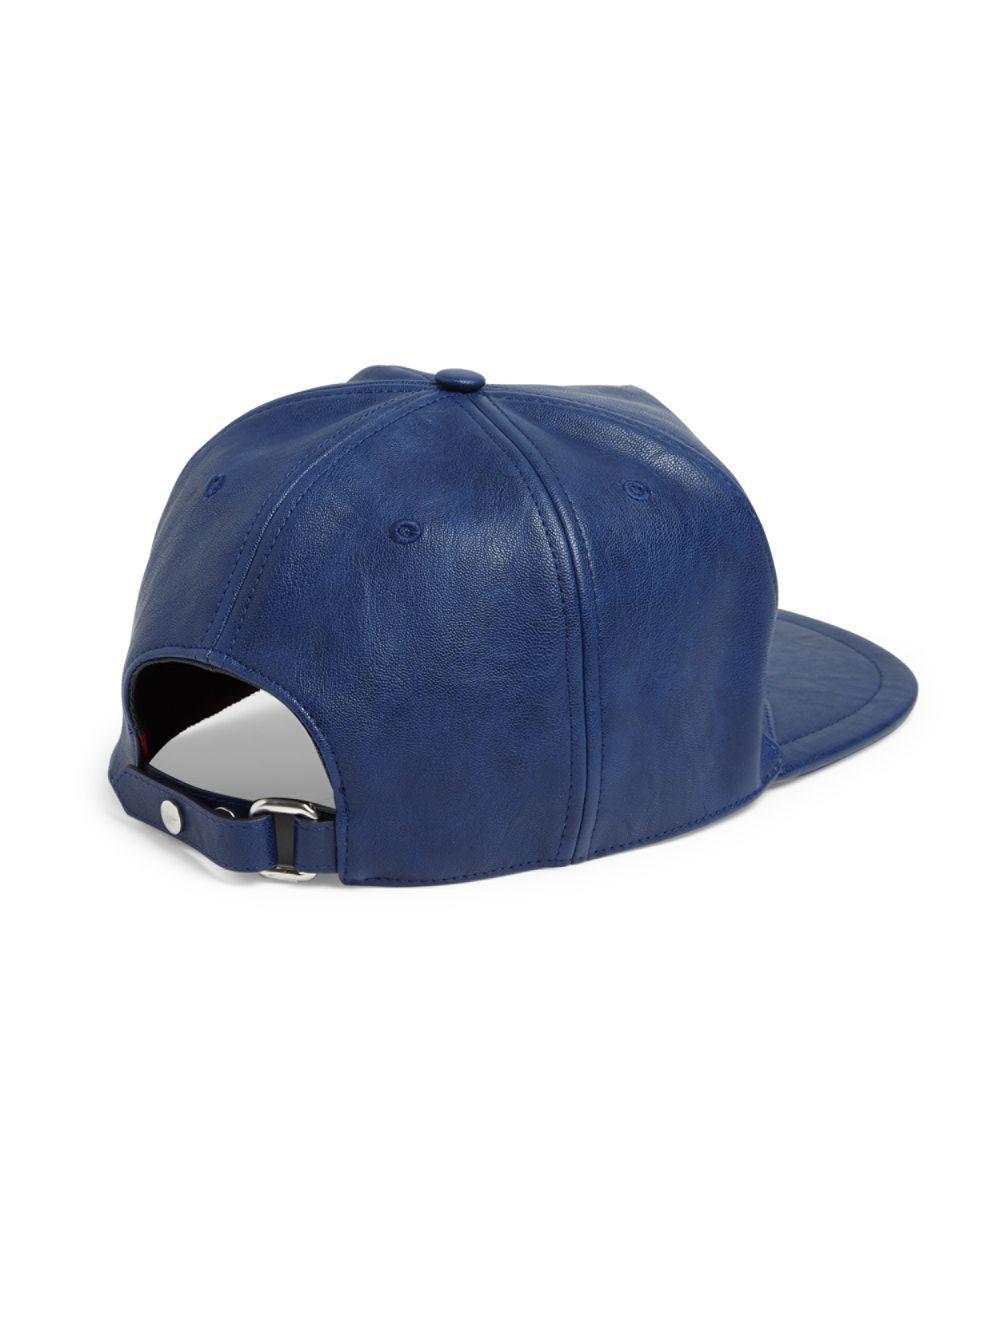 Lyst - Ferragamo Gancini Logo Vegan Leather Hat in Blue for Men 4f4928740541